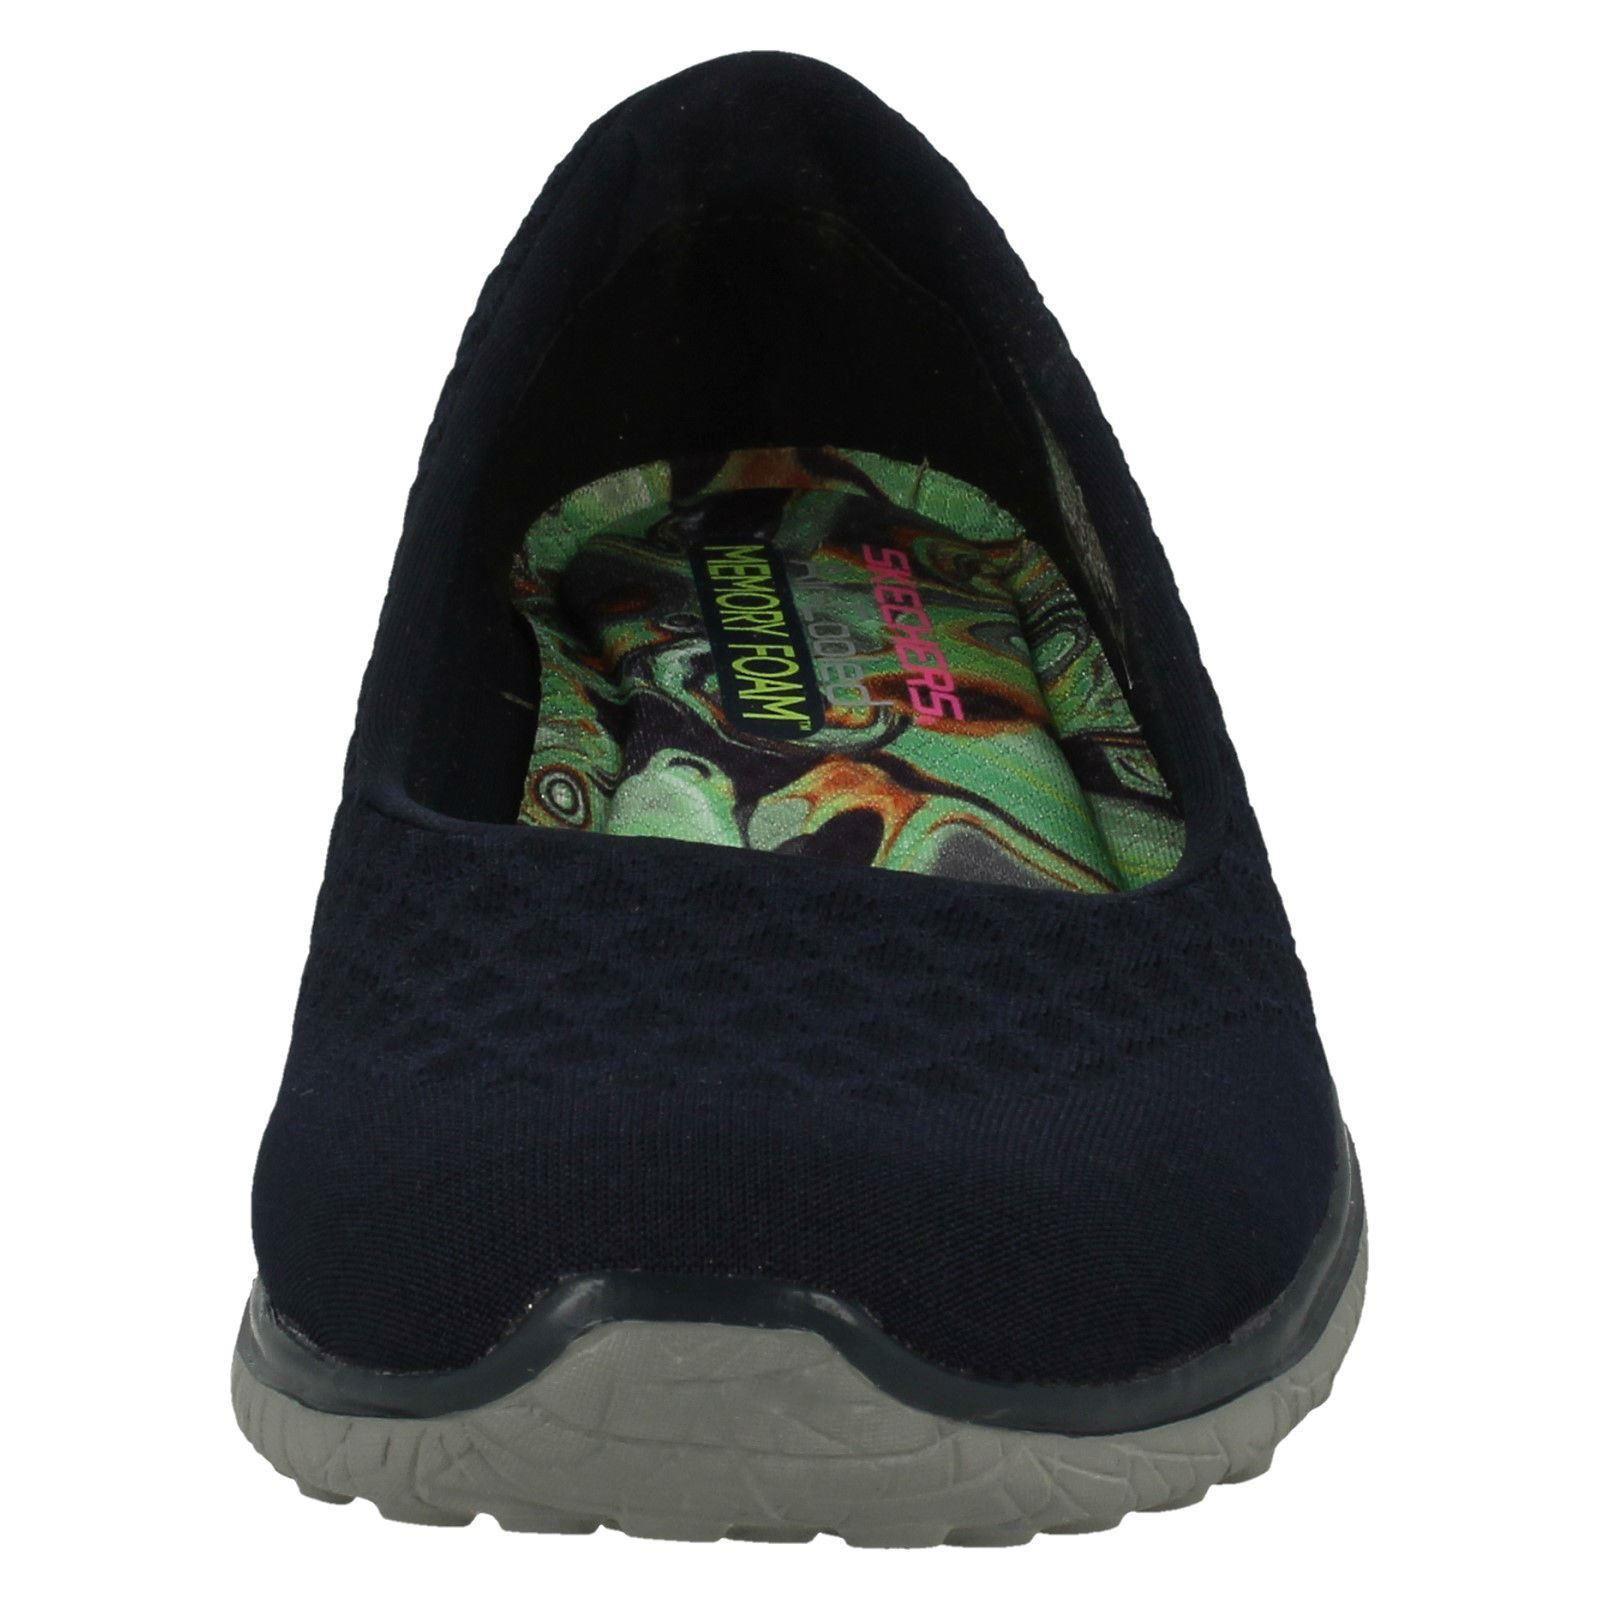 Zapatos Skechers 7105m Viscoelástica Espuma Up 'one Mujer qPW4twdt